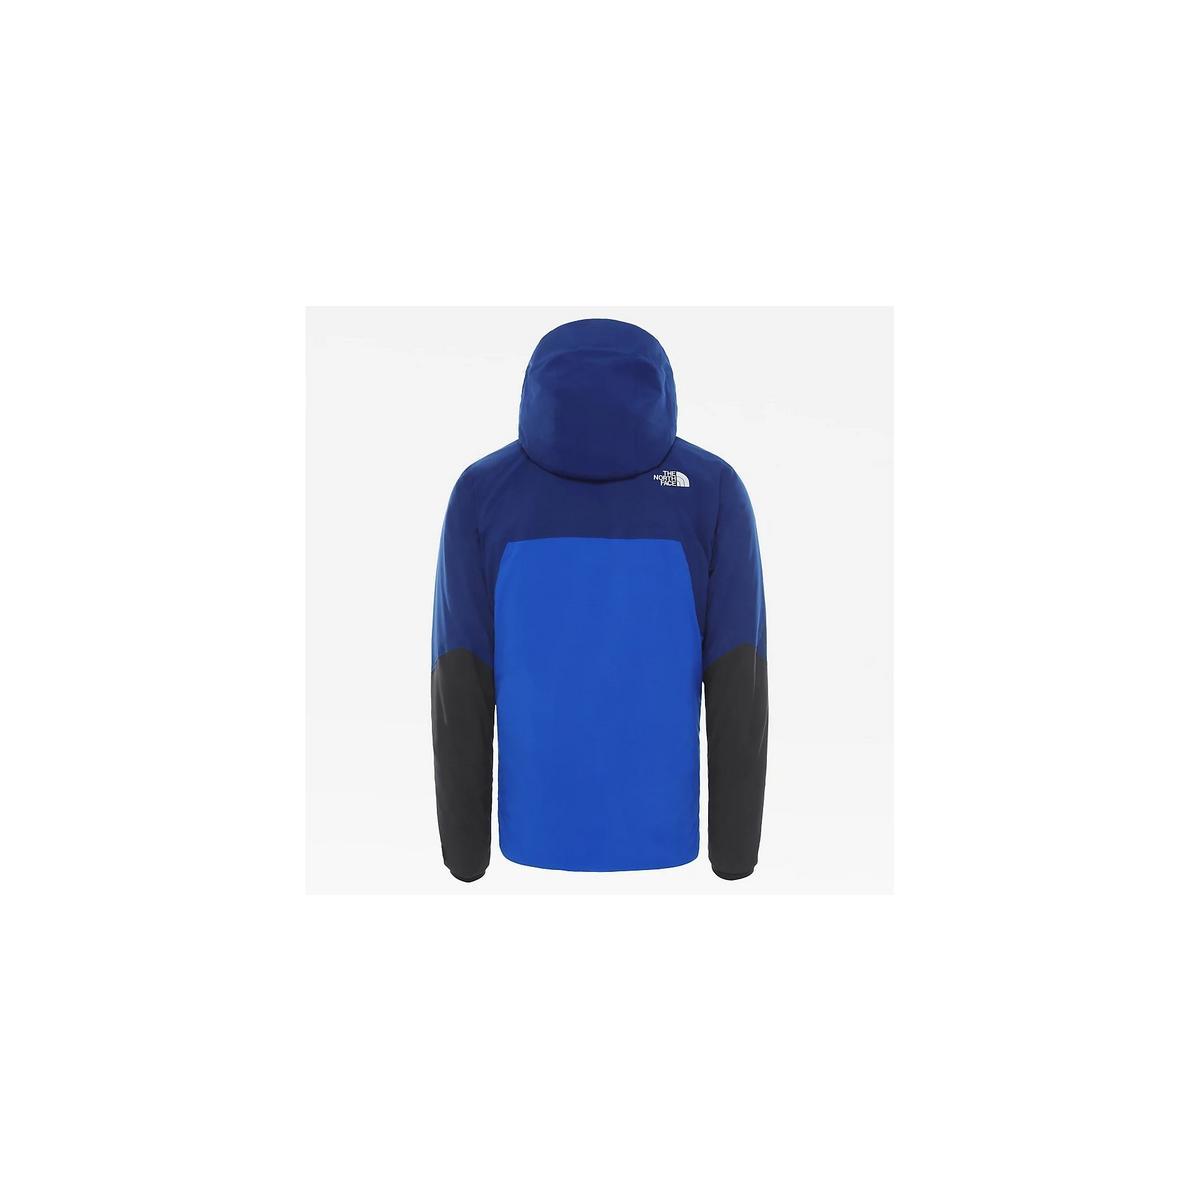 The North Face Apex Flex Snow Jacket